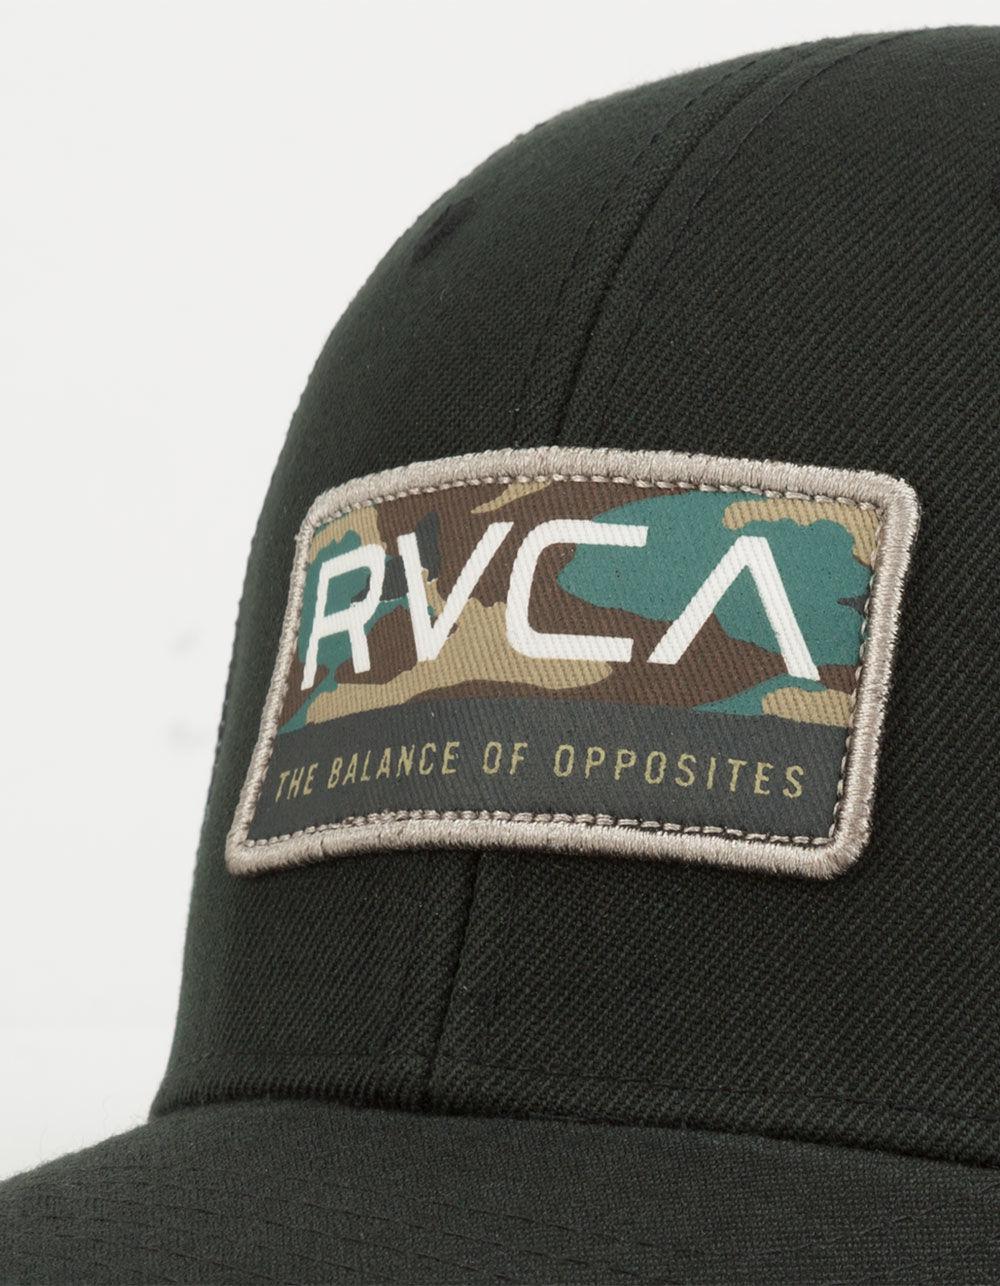 separation shoes a014e c1d54 Lyst - RVCA Reno Mens Trucker Hat in Black for Men